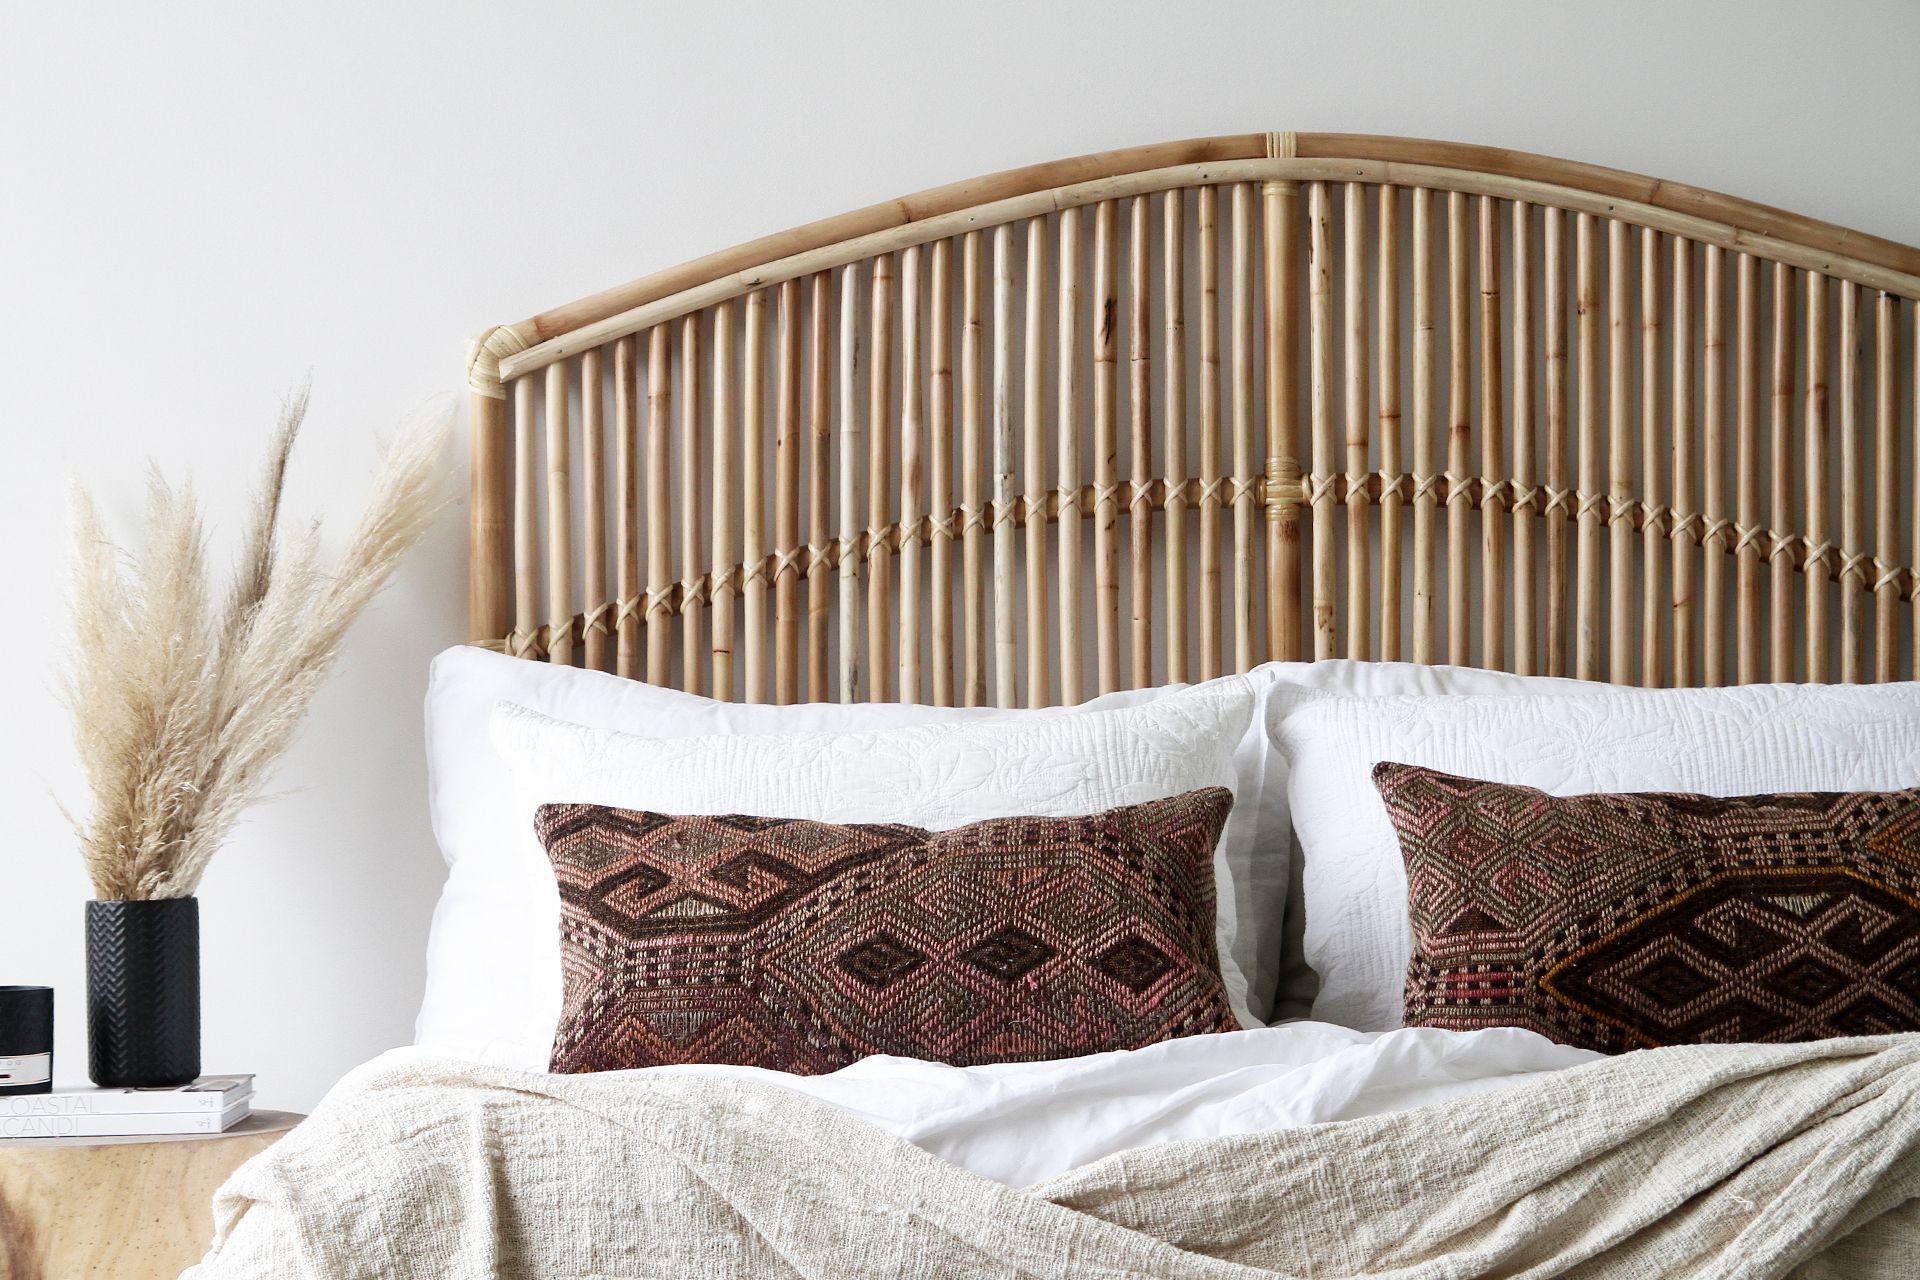 Https Www Naturallycane Com Au Wp Content Uploads 2018 07 Momi King Bedhead Ls Jpg King Bed Mattress Bed Pillows Bed Sizes